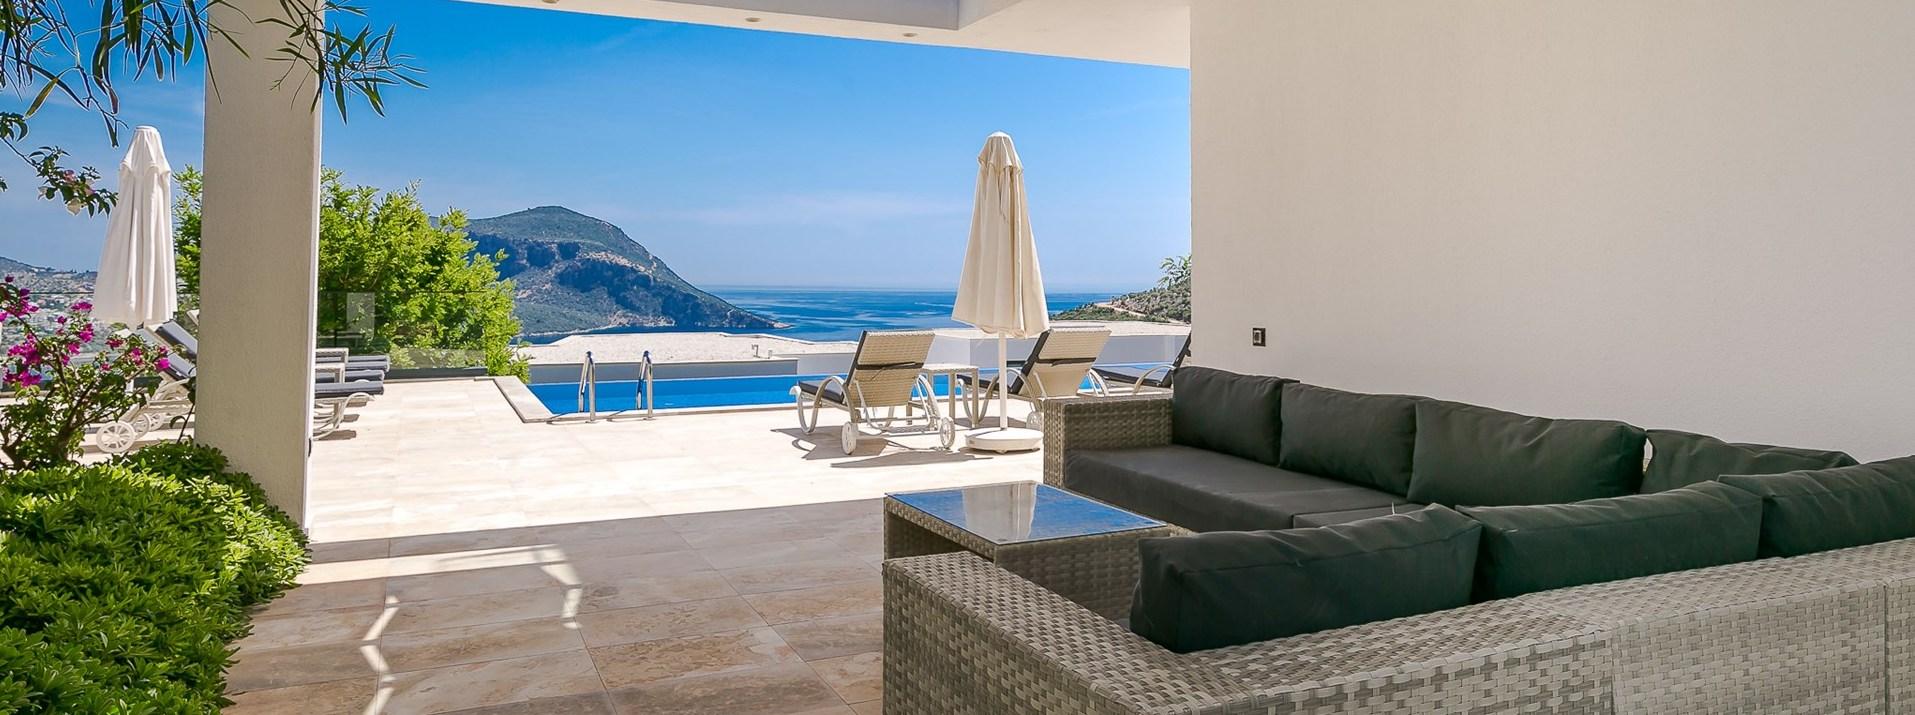 luxury-family-villa-holidays-kalkan